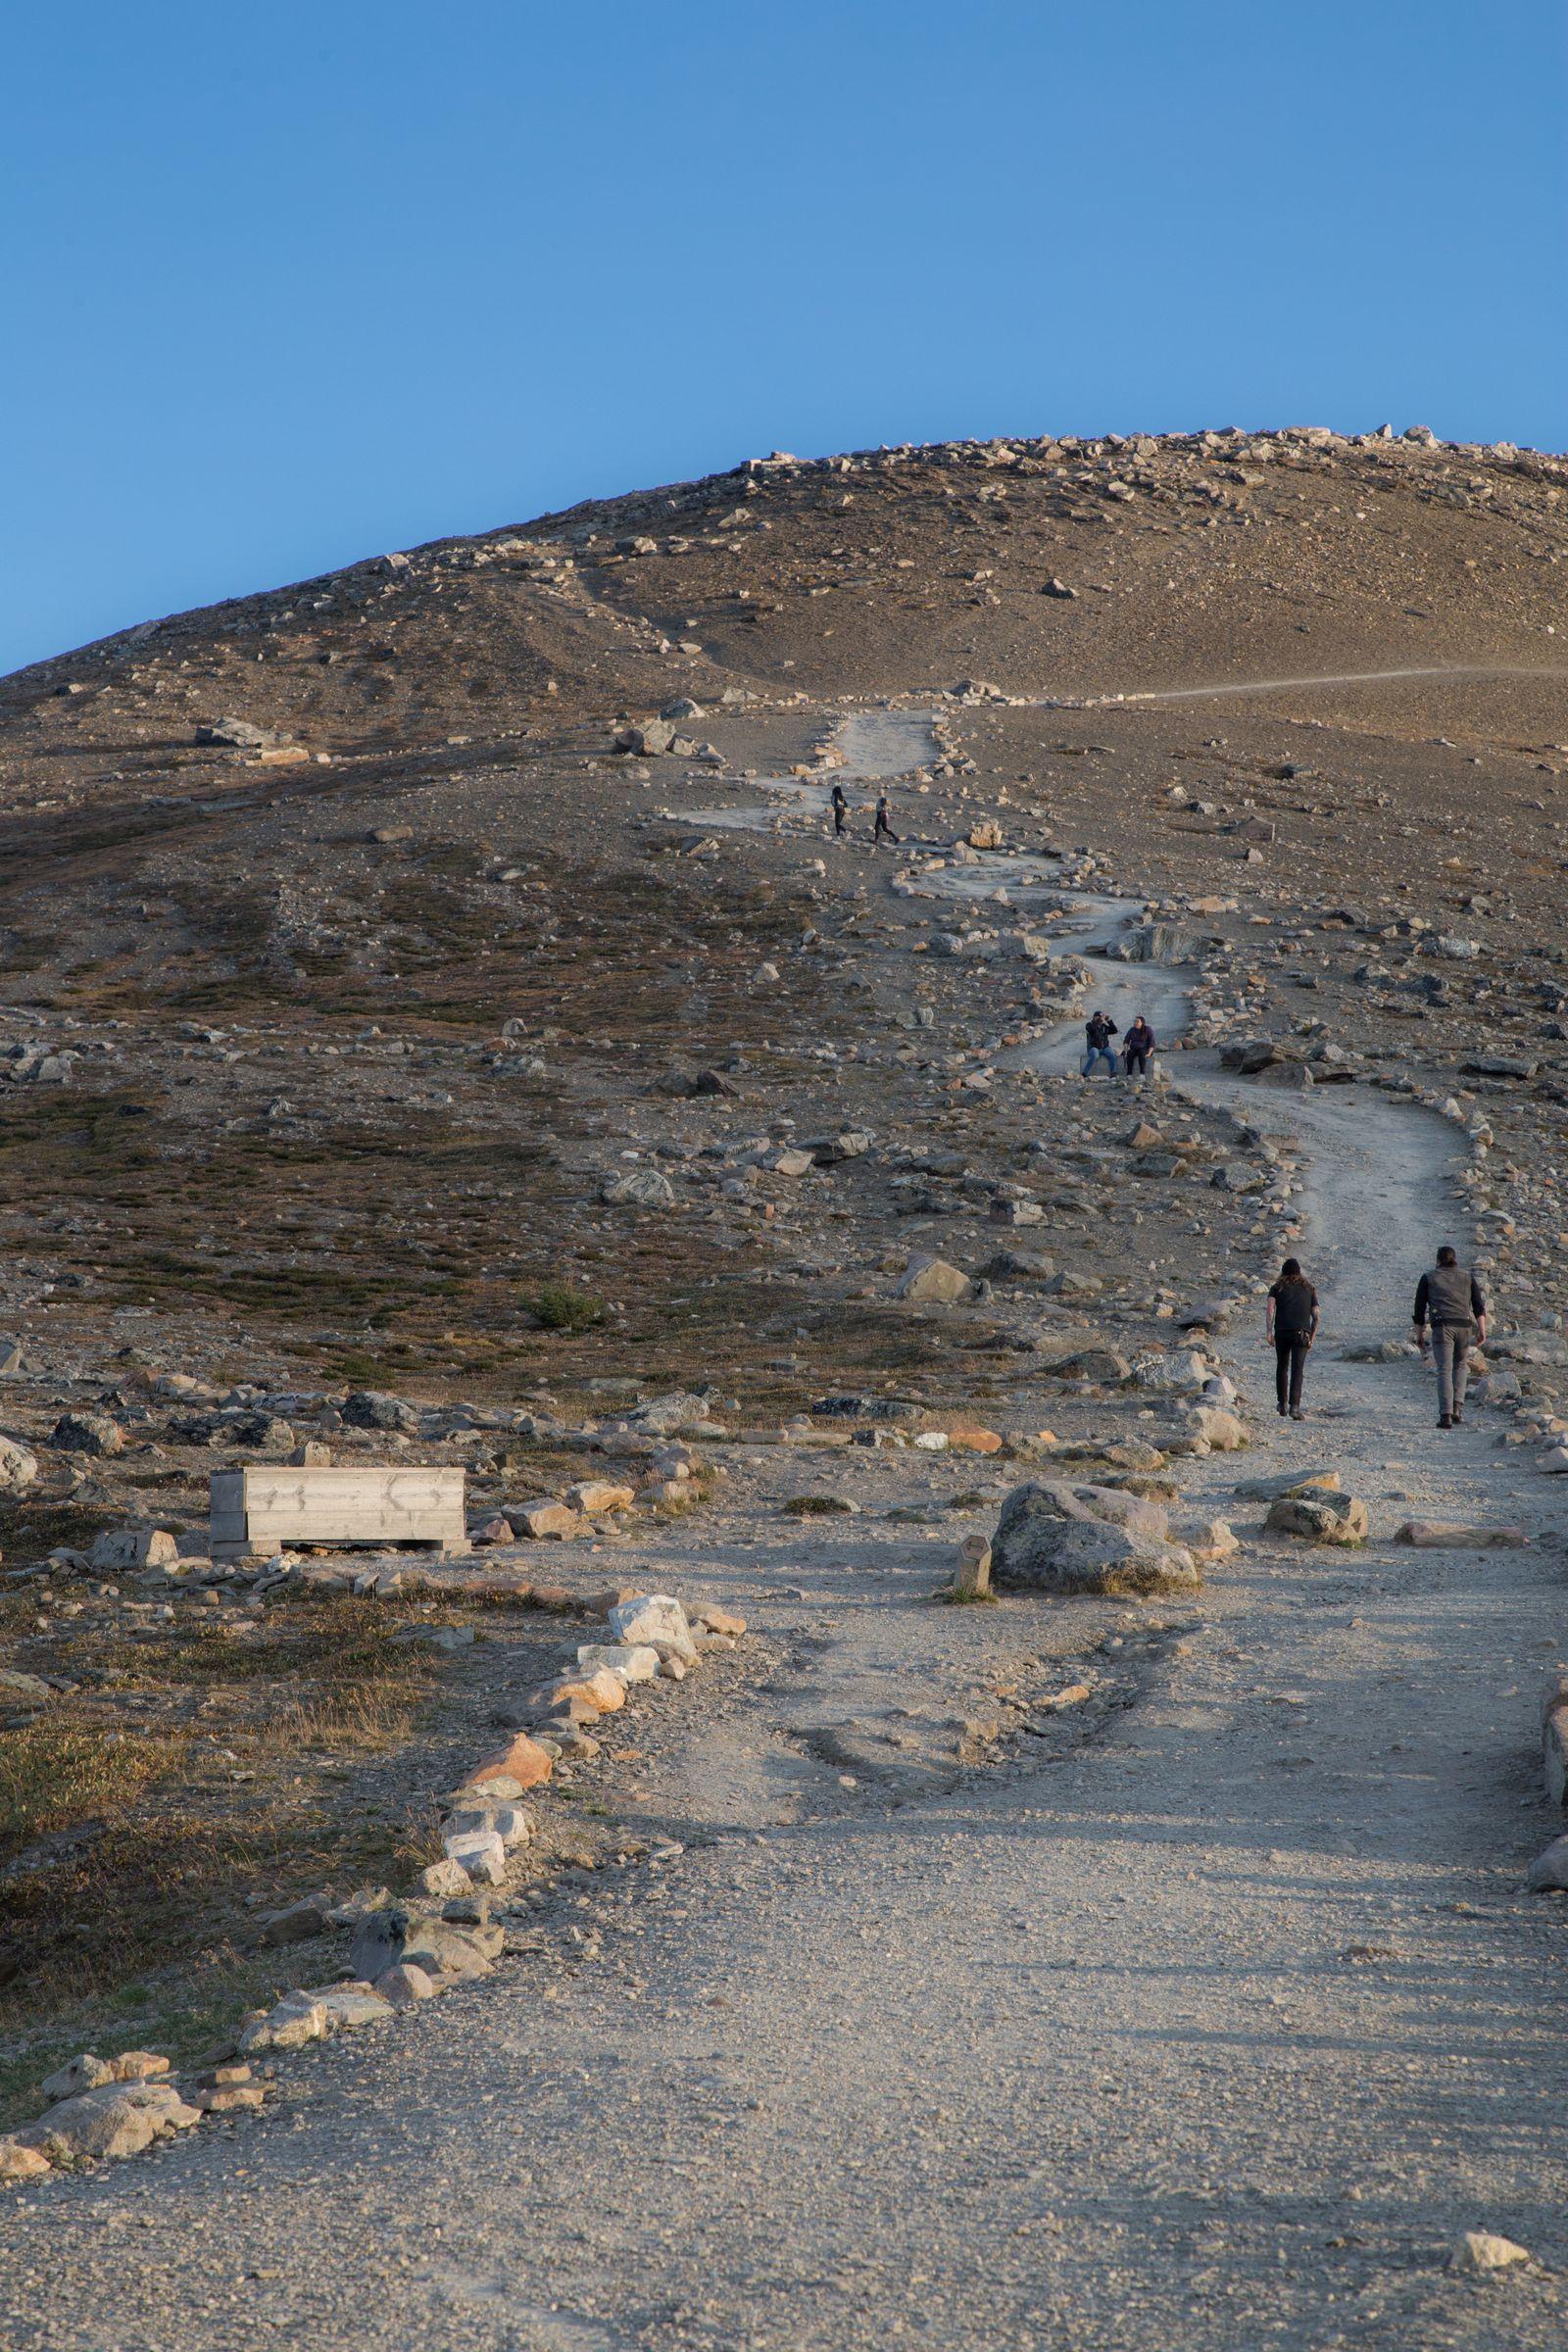 Inicio de la subida Whistler Mountain